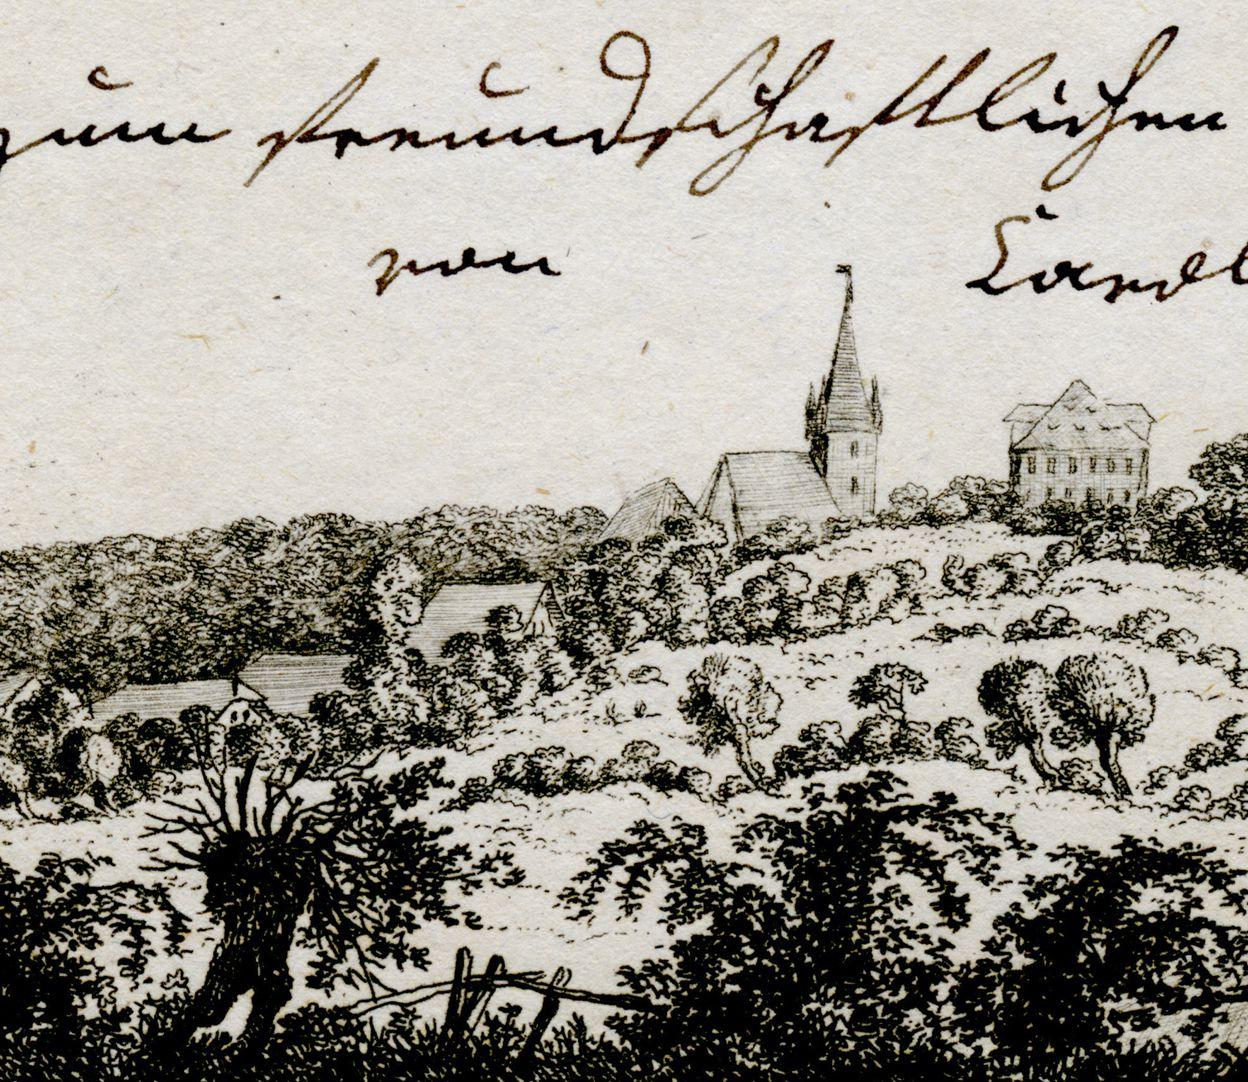 Heroldsberg Ansicht mit Heroldsberg, St. Matthäus und Rotem (?) Schloss